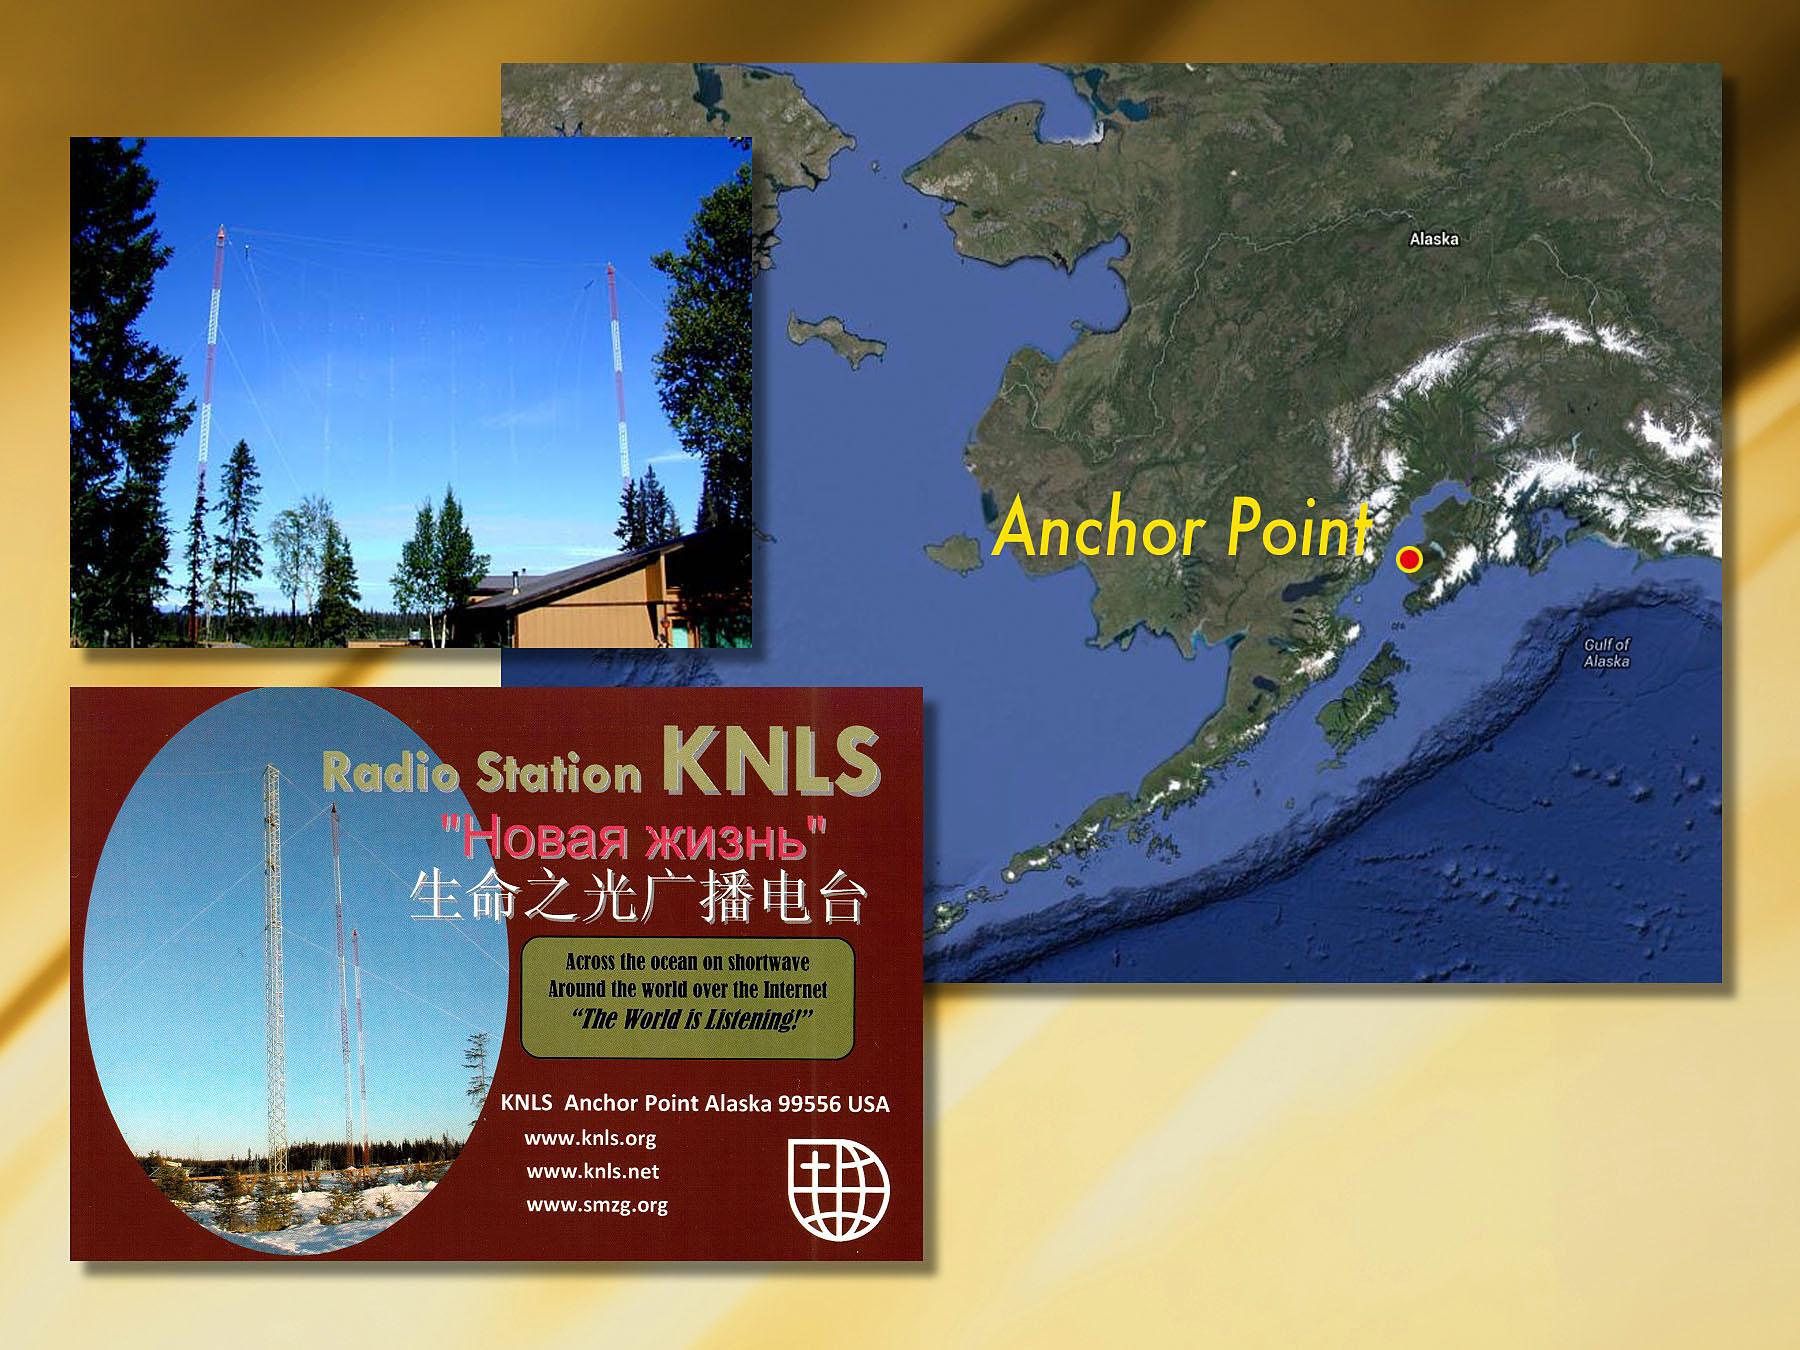 KNLS, Alaska. | remotedx